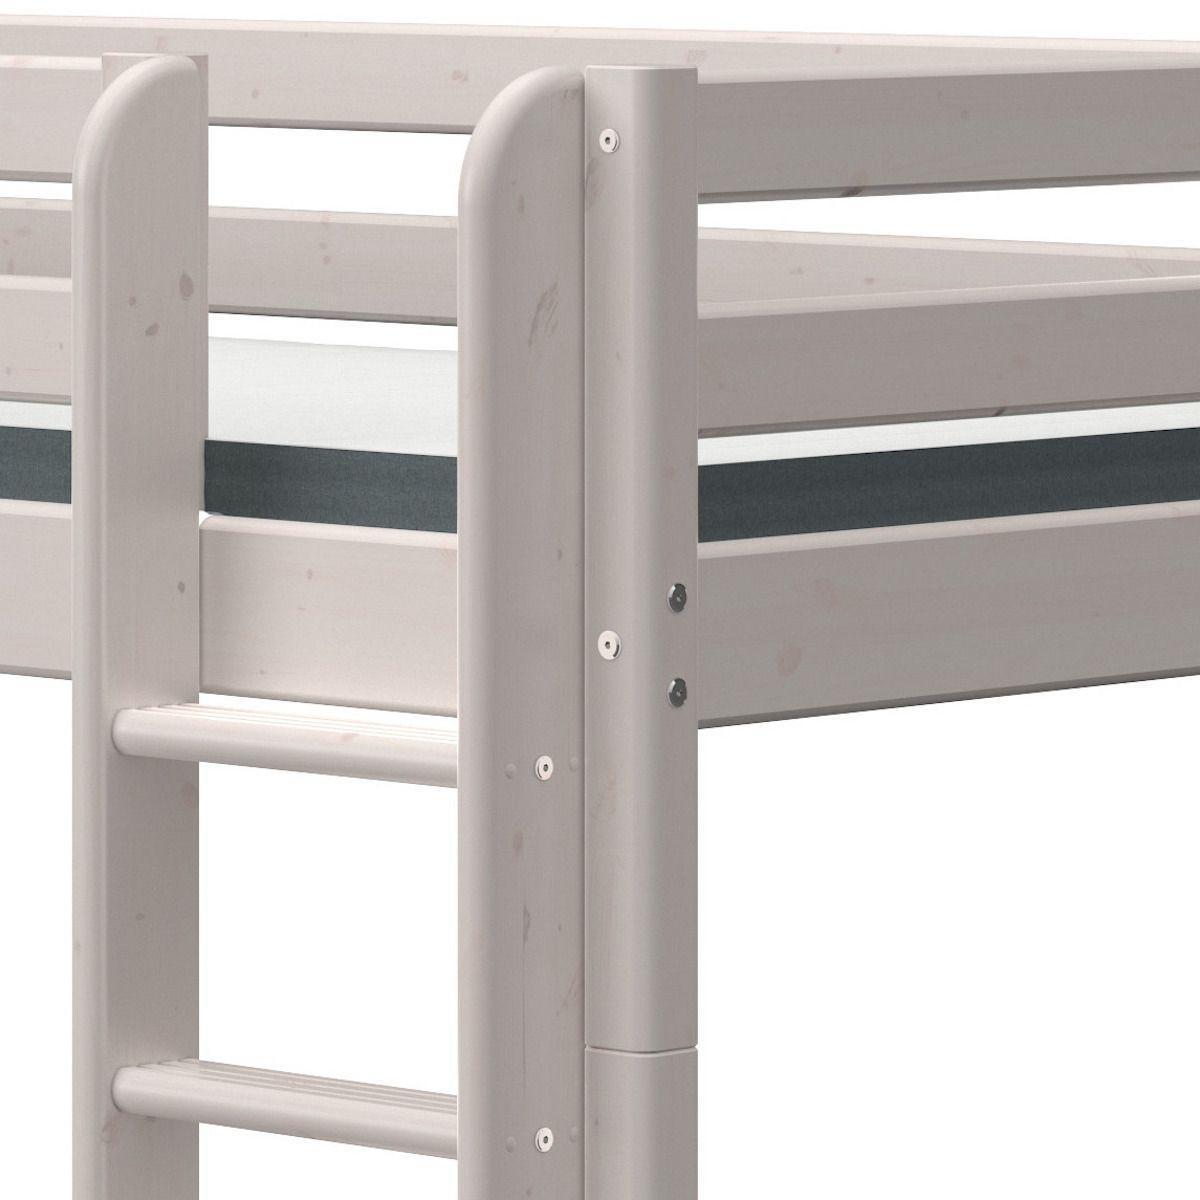 Etagenbett 90x200cm gerade Leiter CLASSIC grey washed